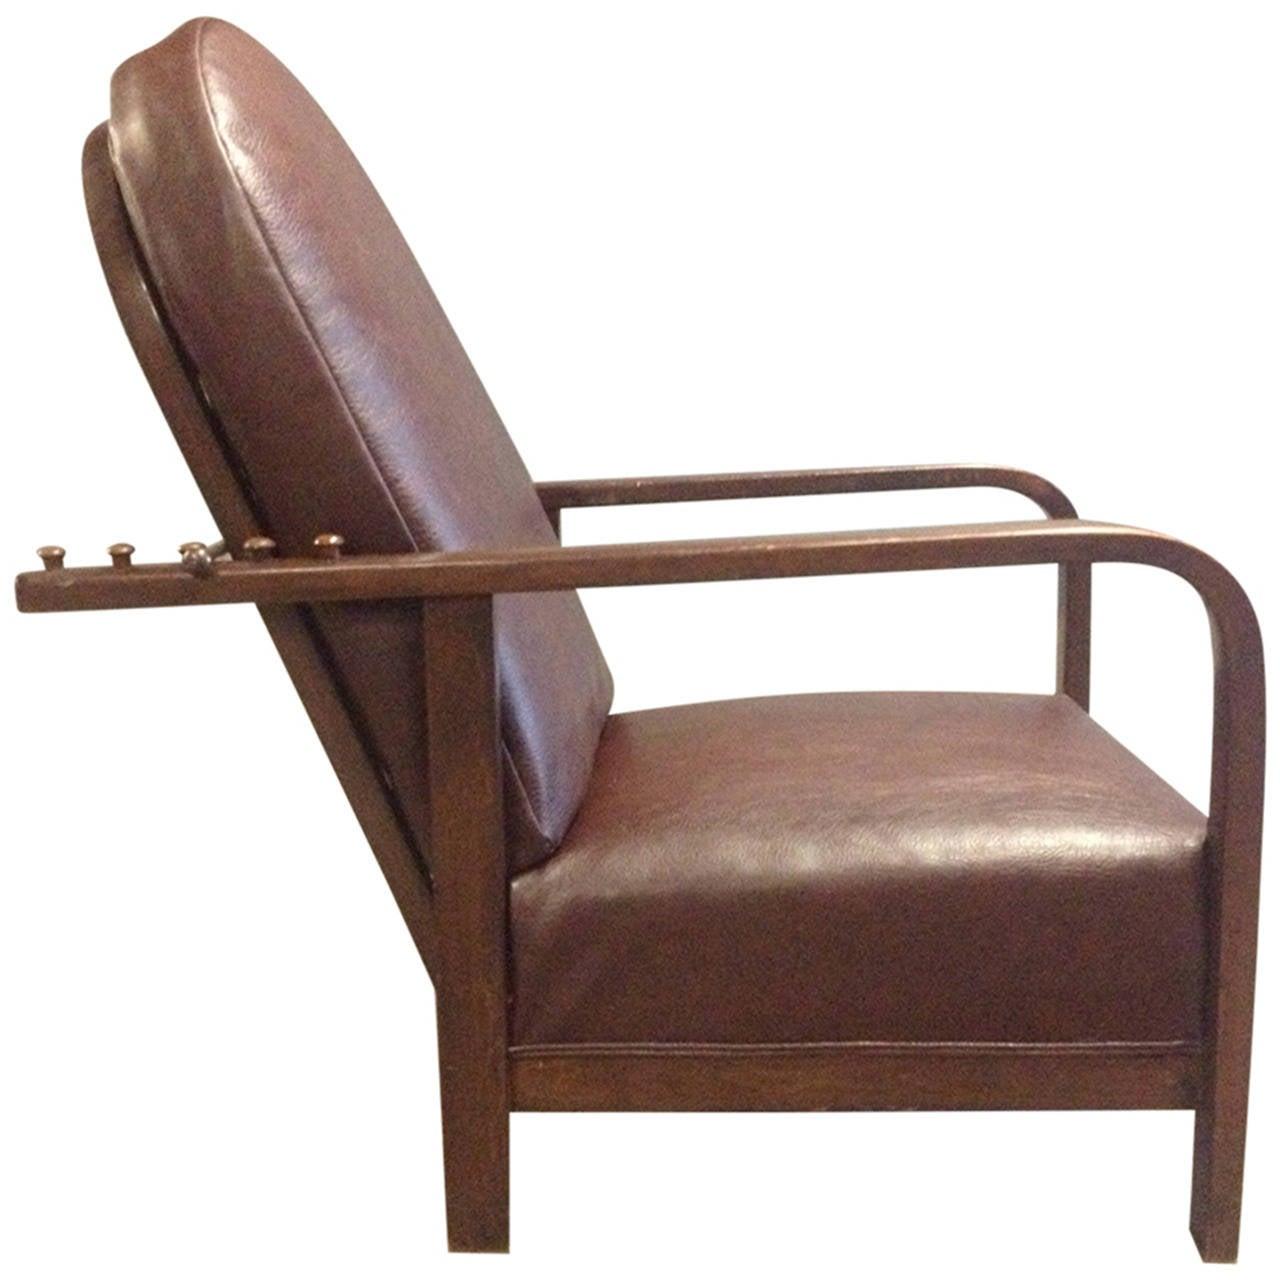 Reclining Chair by Josef Hoffmann 1  sc 1 st  1stDibs & Reclining Chair by Josef Hoffmann For Sale at 1stdibs islam-shia.org